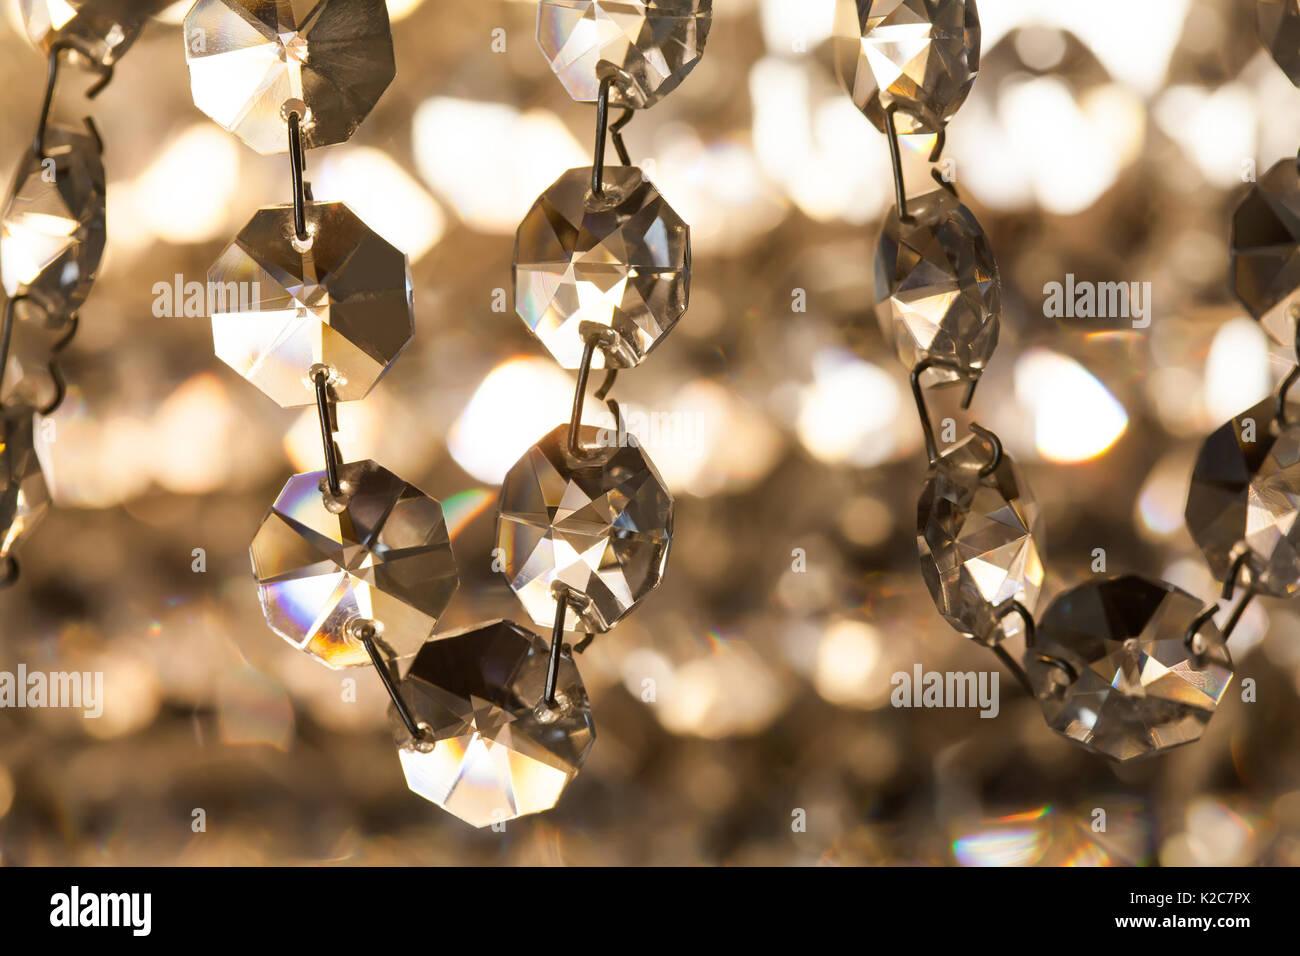 Retro Style Crystal Chandelier Transparent Pendant Macro View Light Background Soft Focus